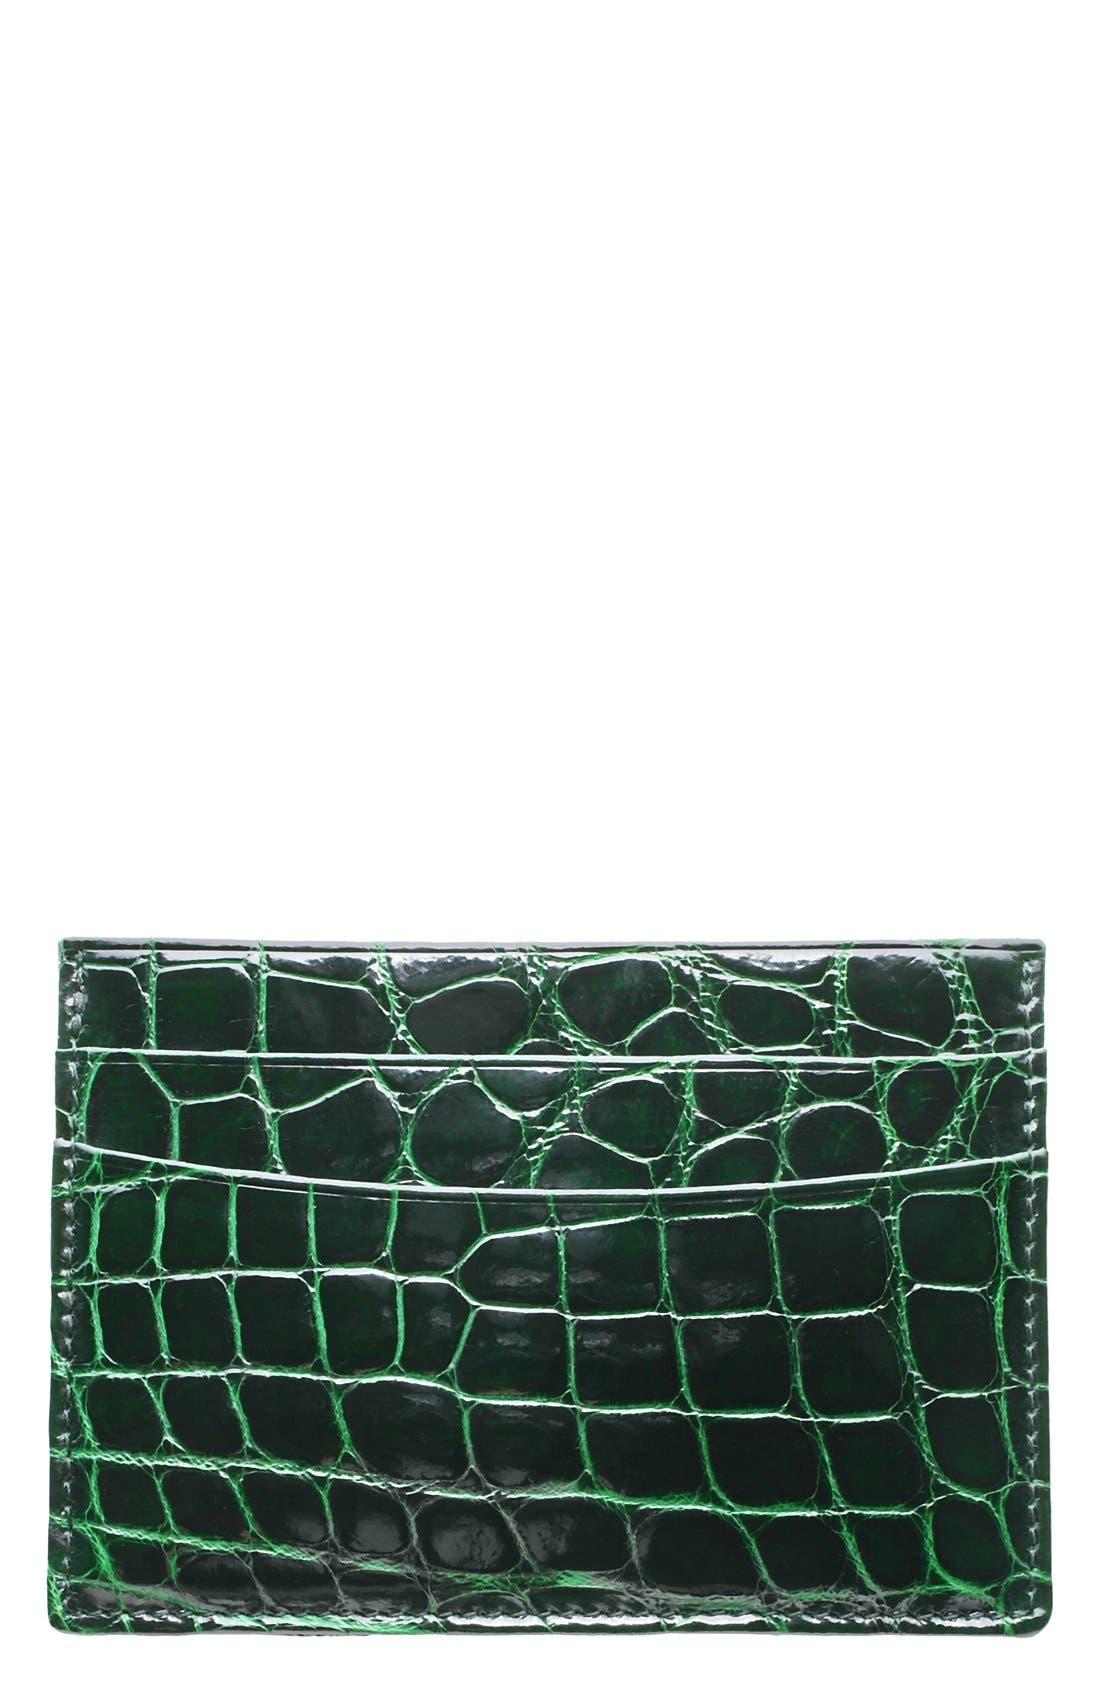 Alternate Image 1 Selected - Trafalgar Genuine Alligator Leather Card Case